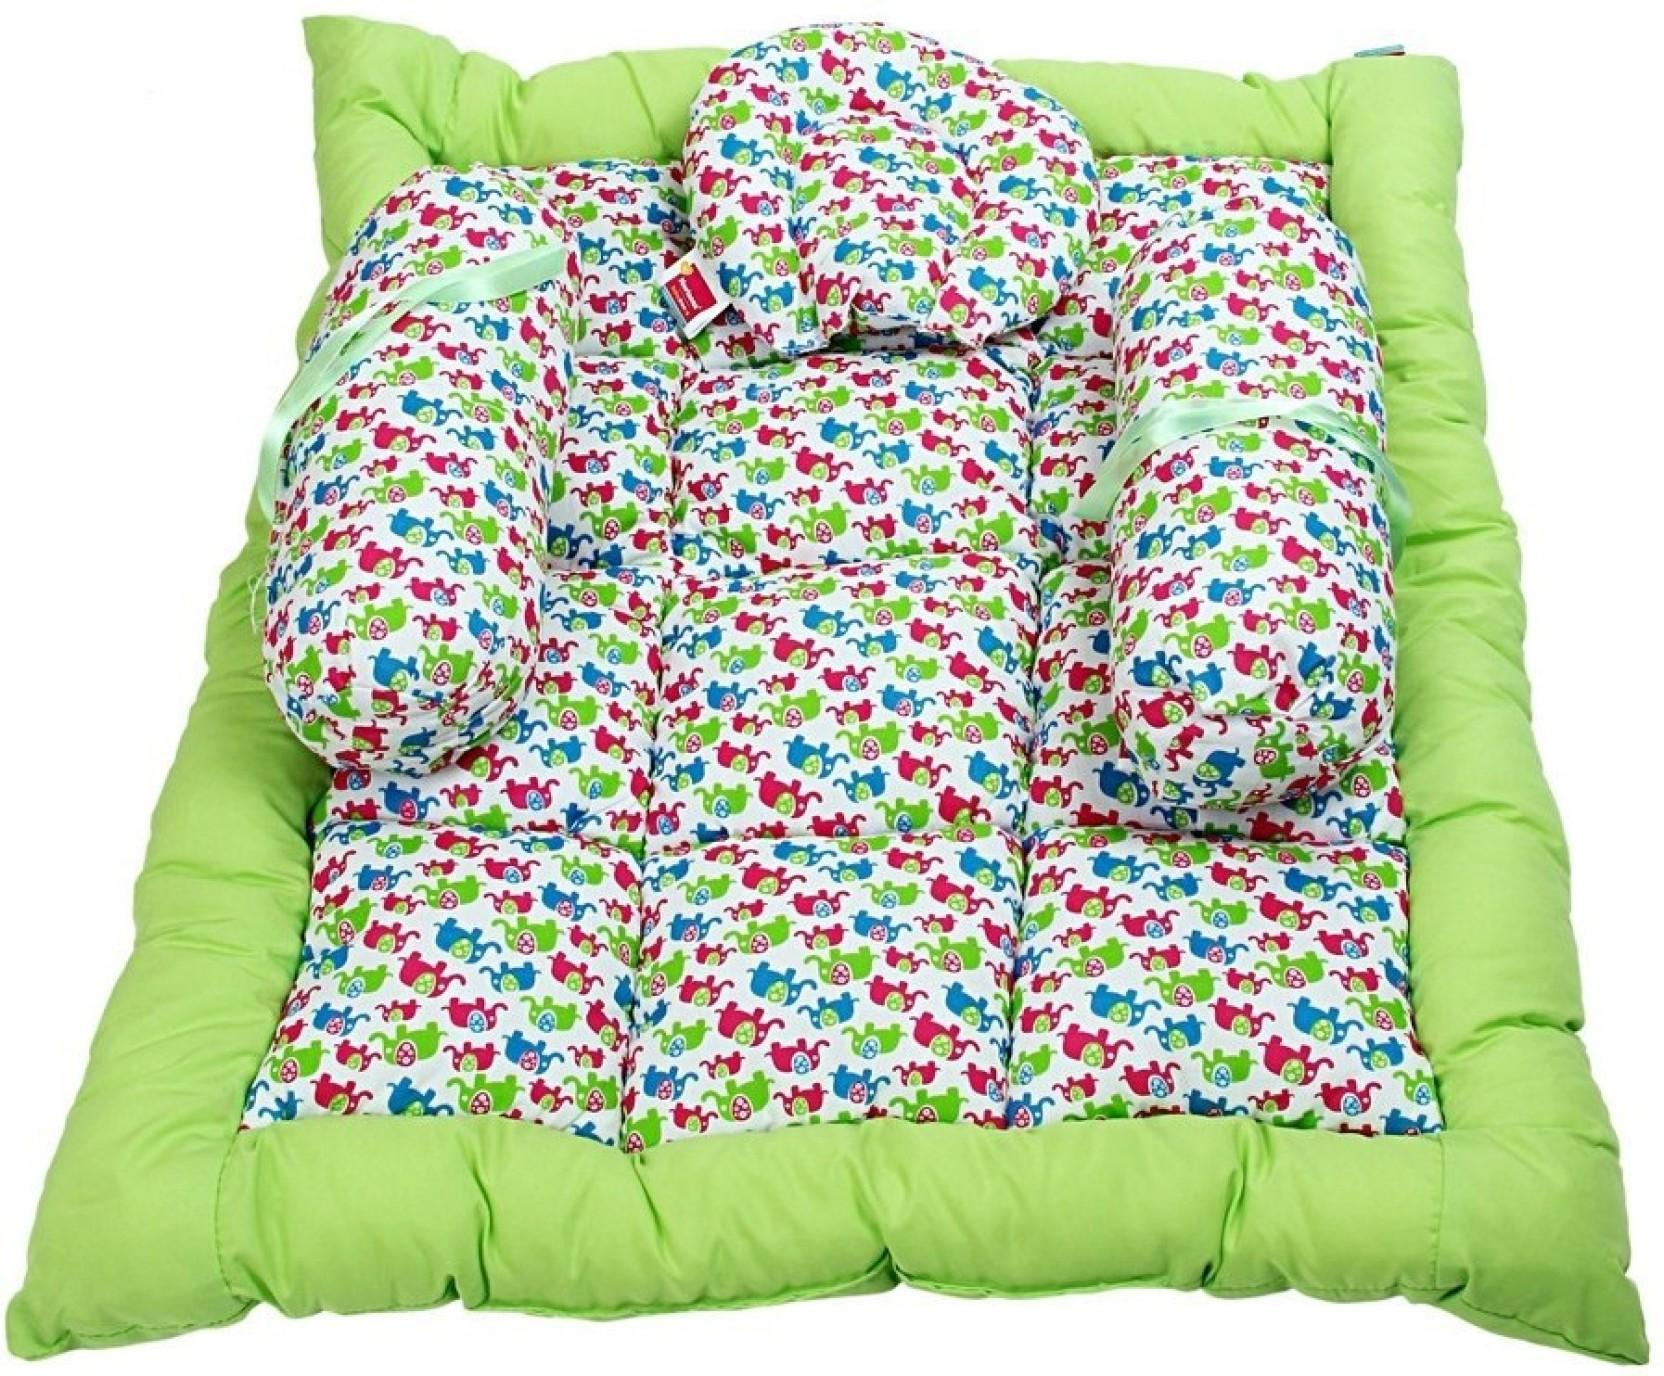 Morisons Baby Dreams Elephant Print Bed Set Carry Mattress